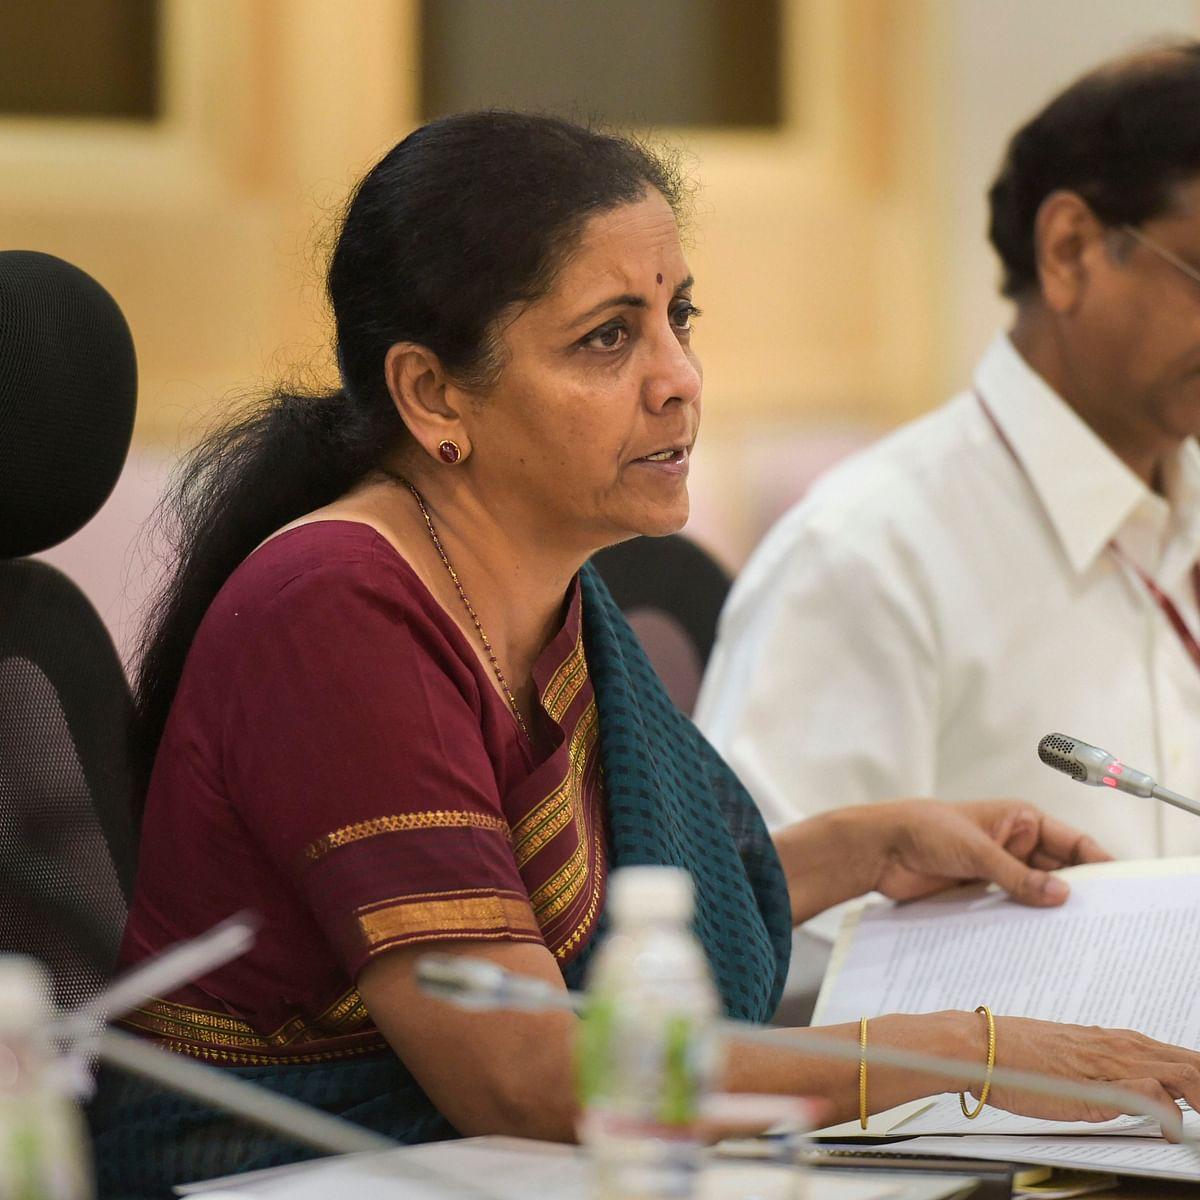 Nirmala Sitharaman Says Corporate Tax For Companies To Be Cut Gradually